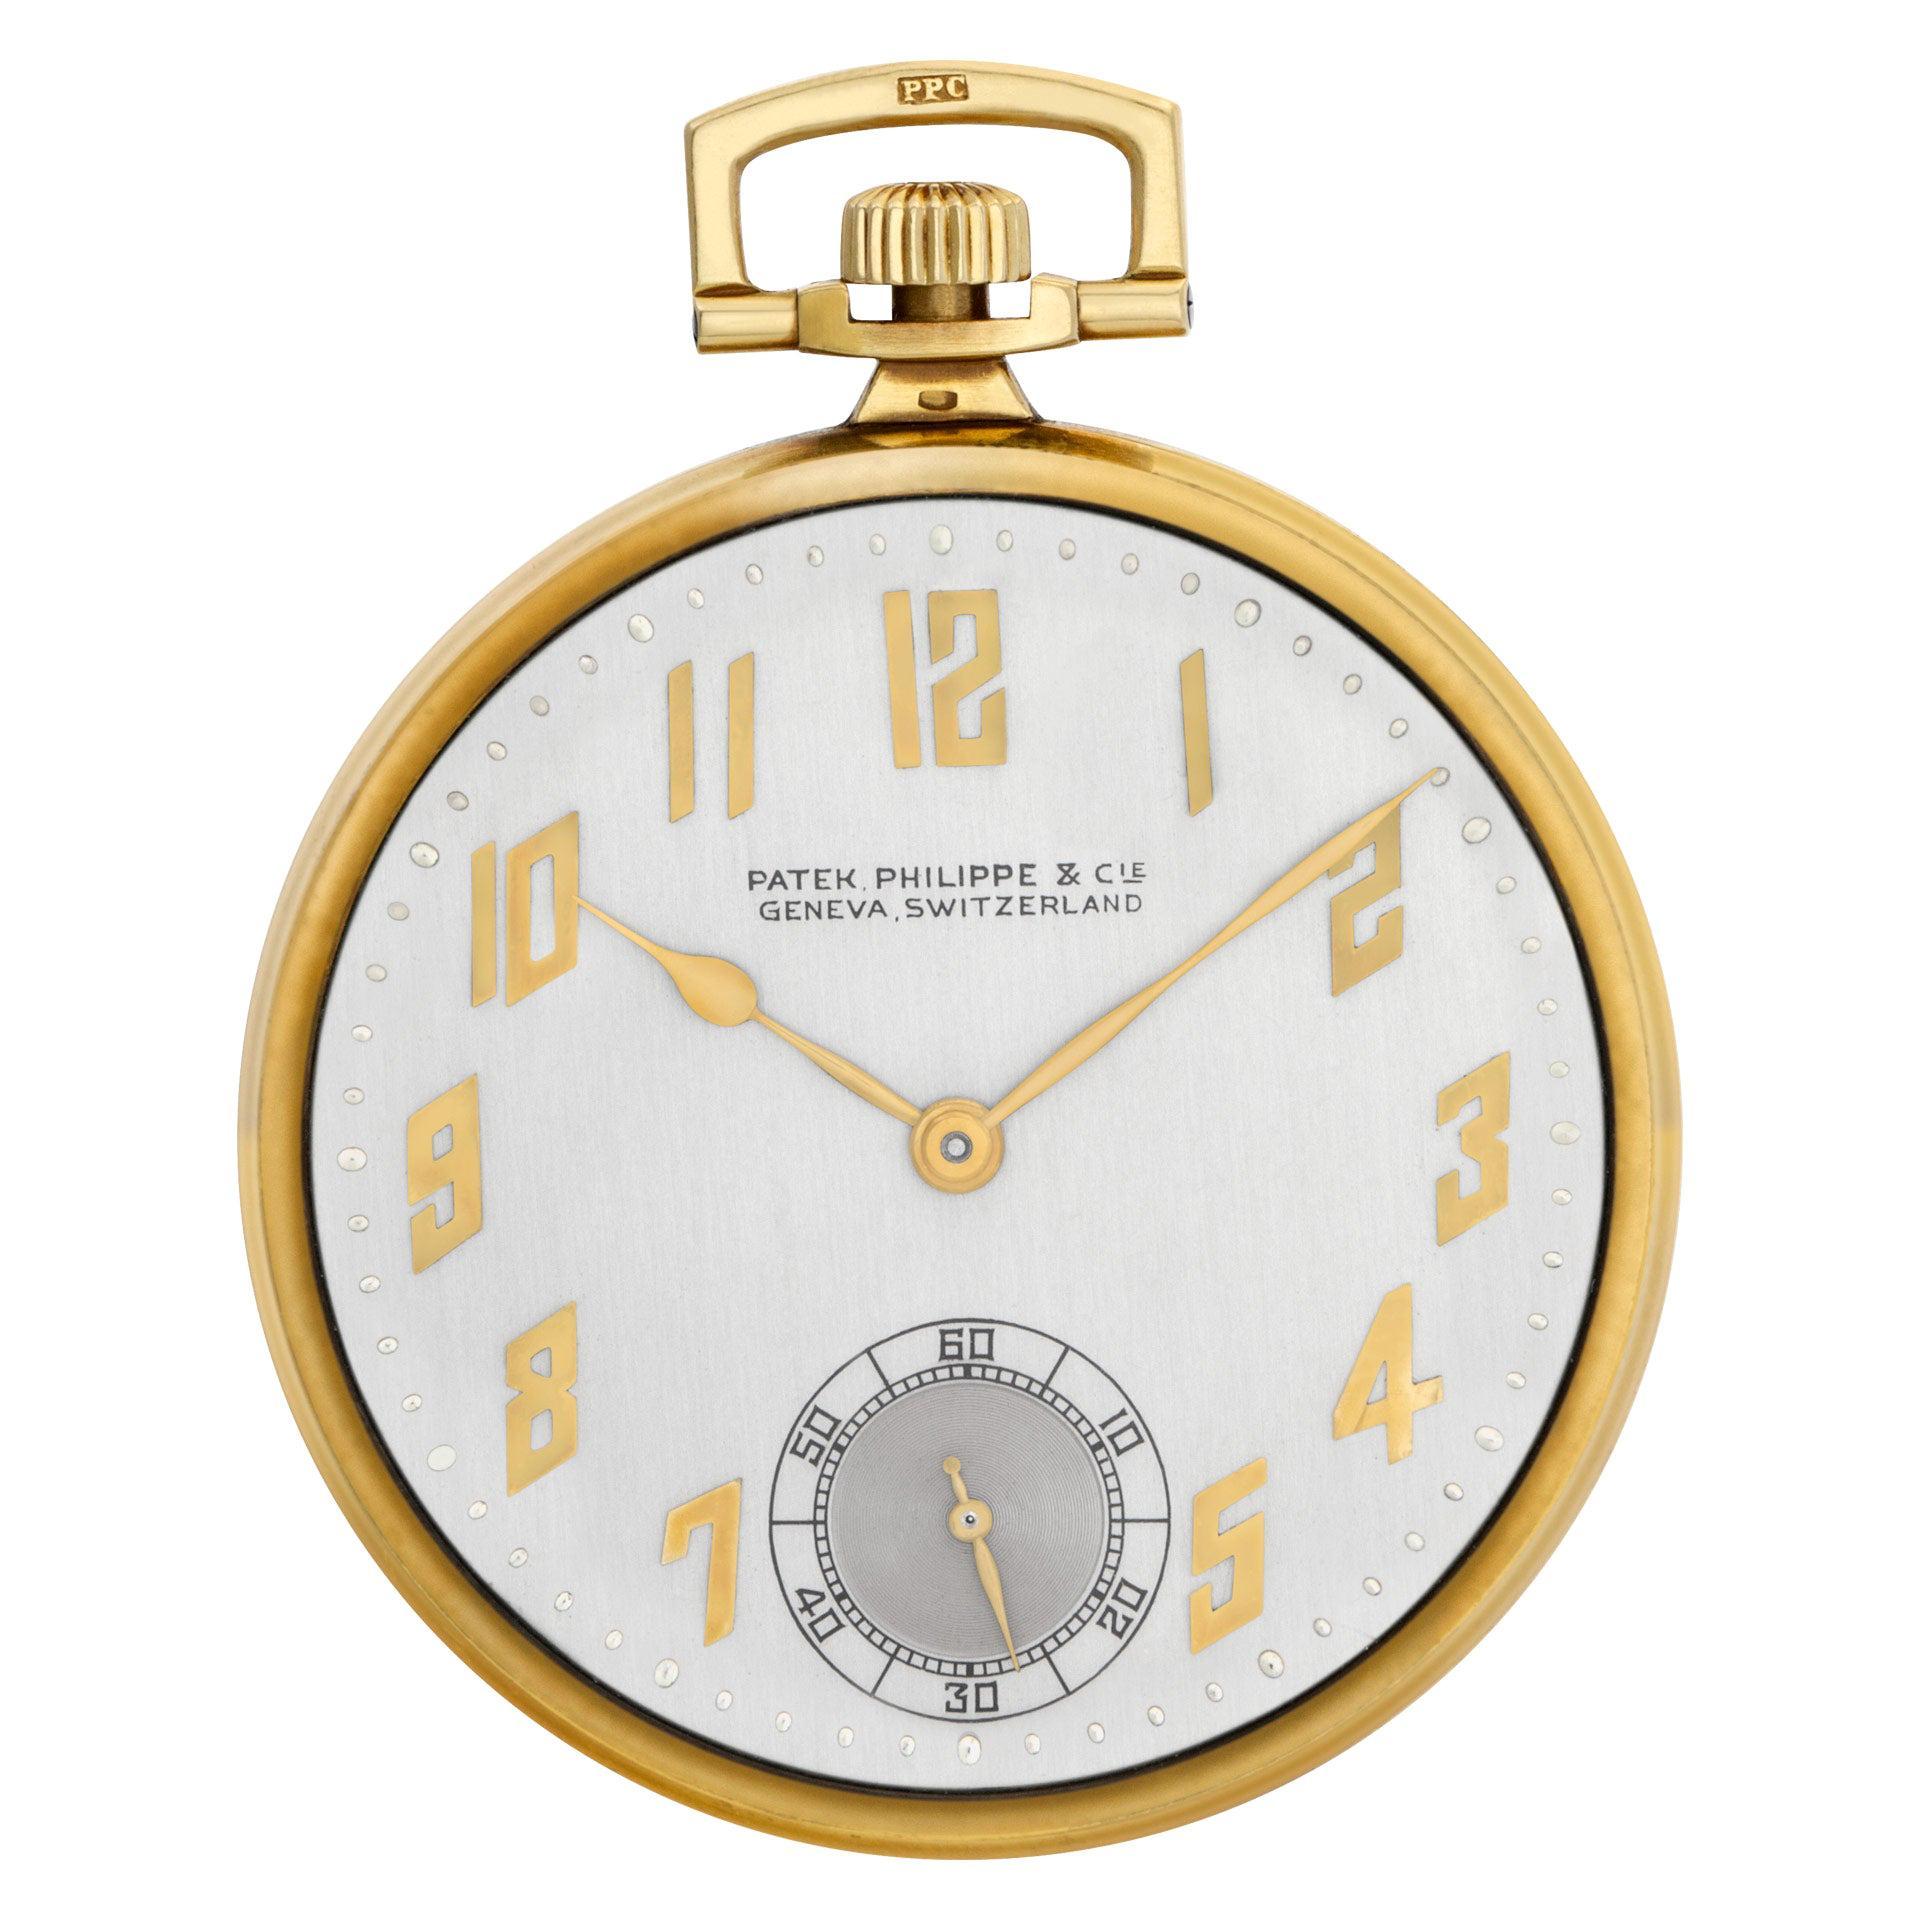 Patek Philippe Pocket Watch Pocket Watch 18k Manual Watch